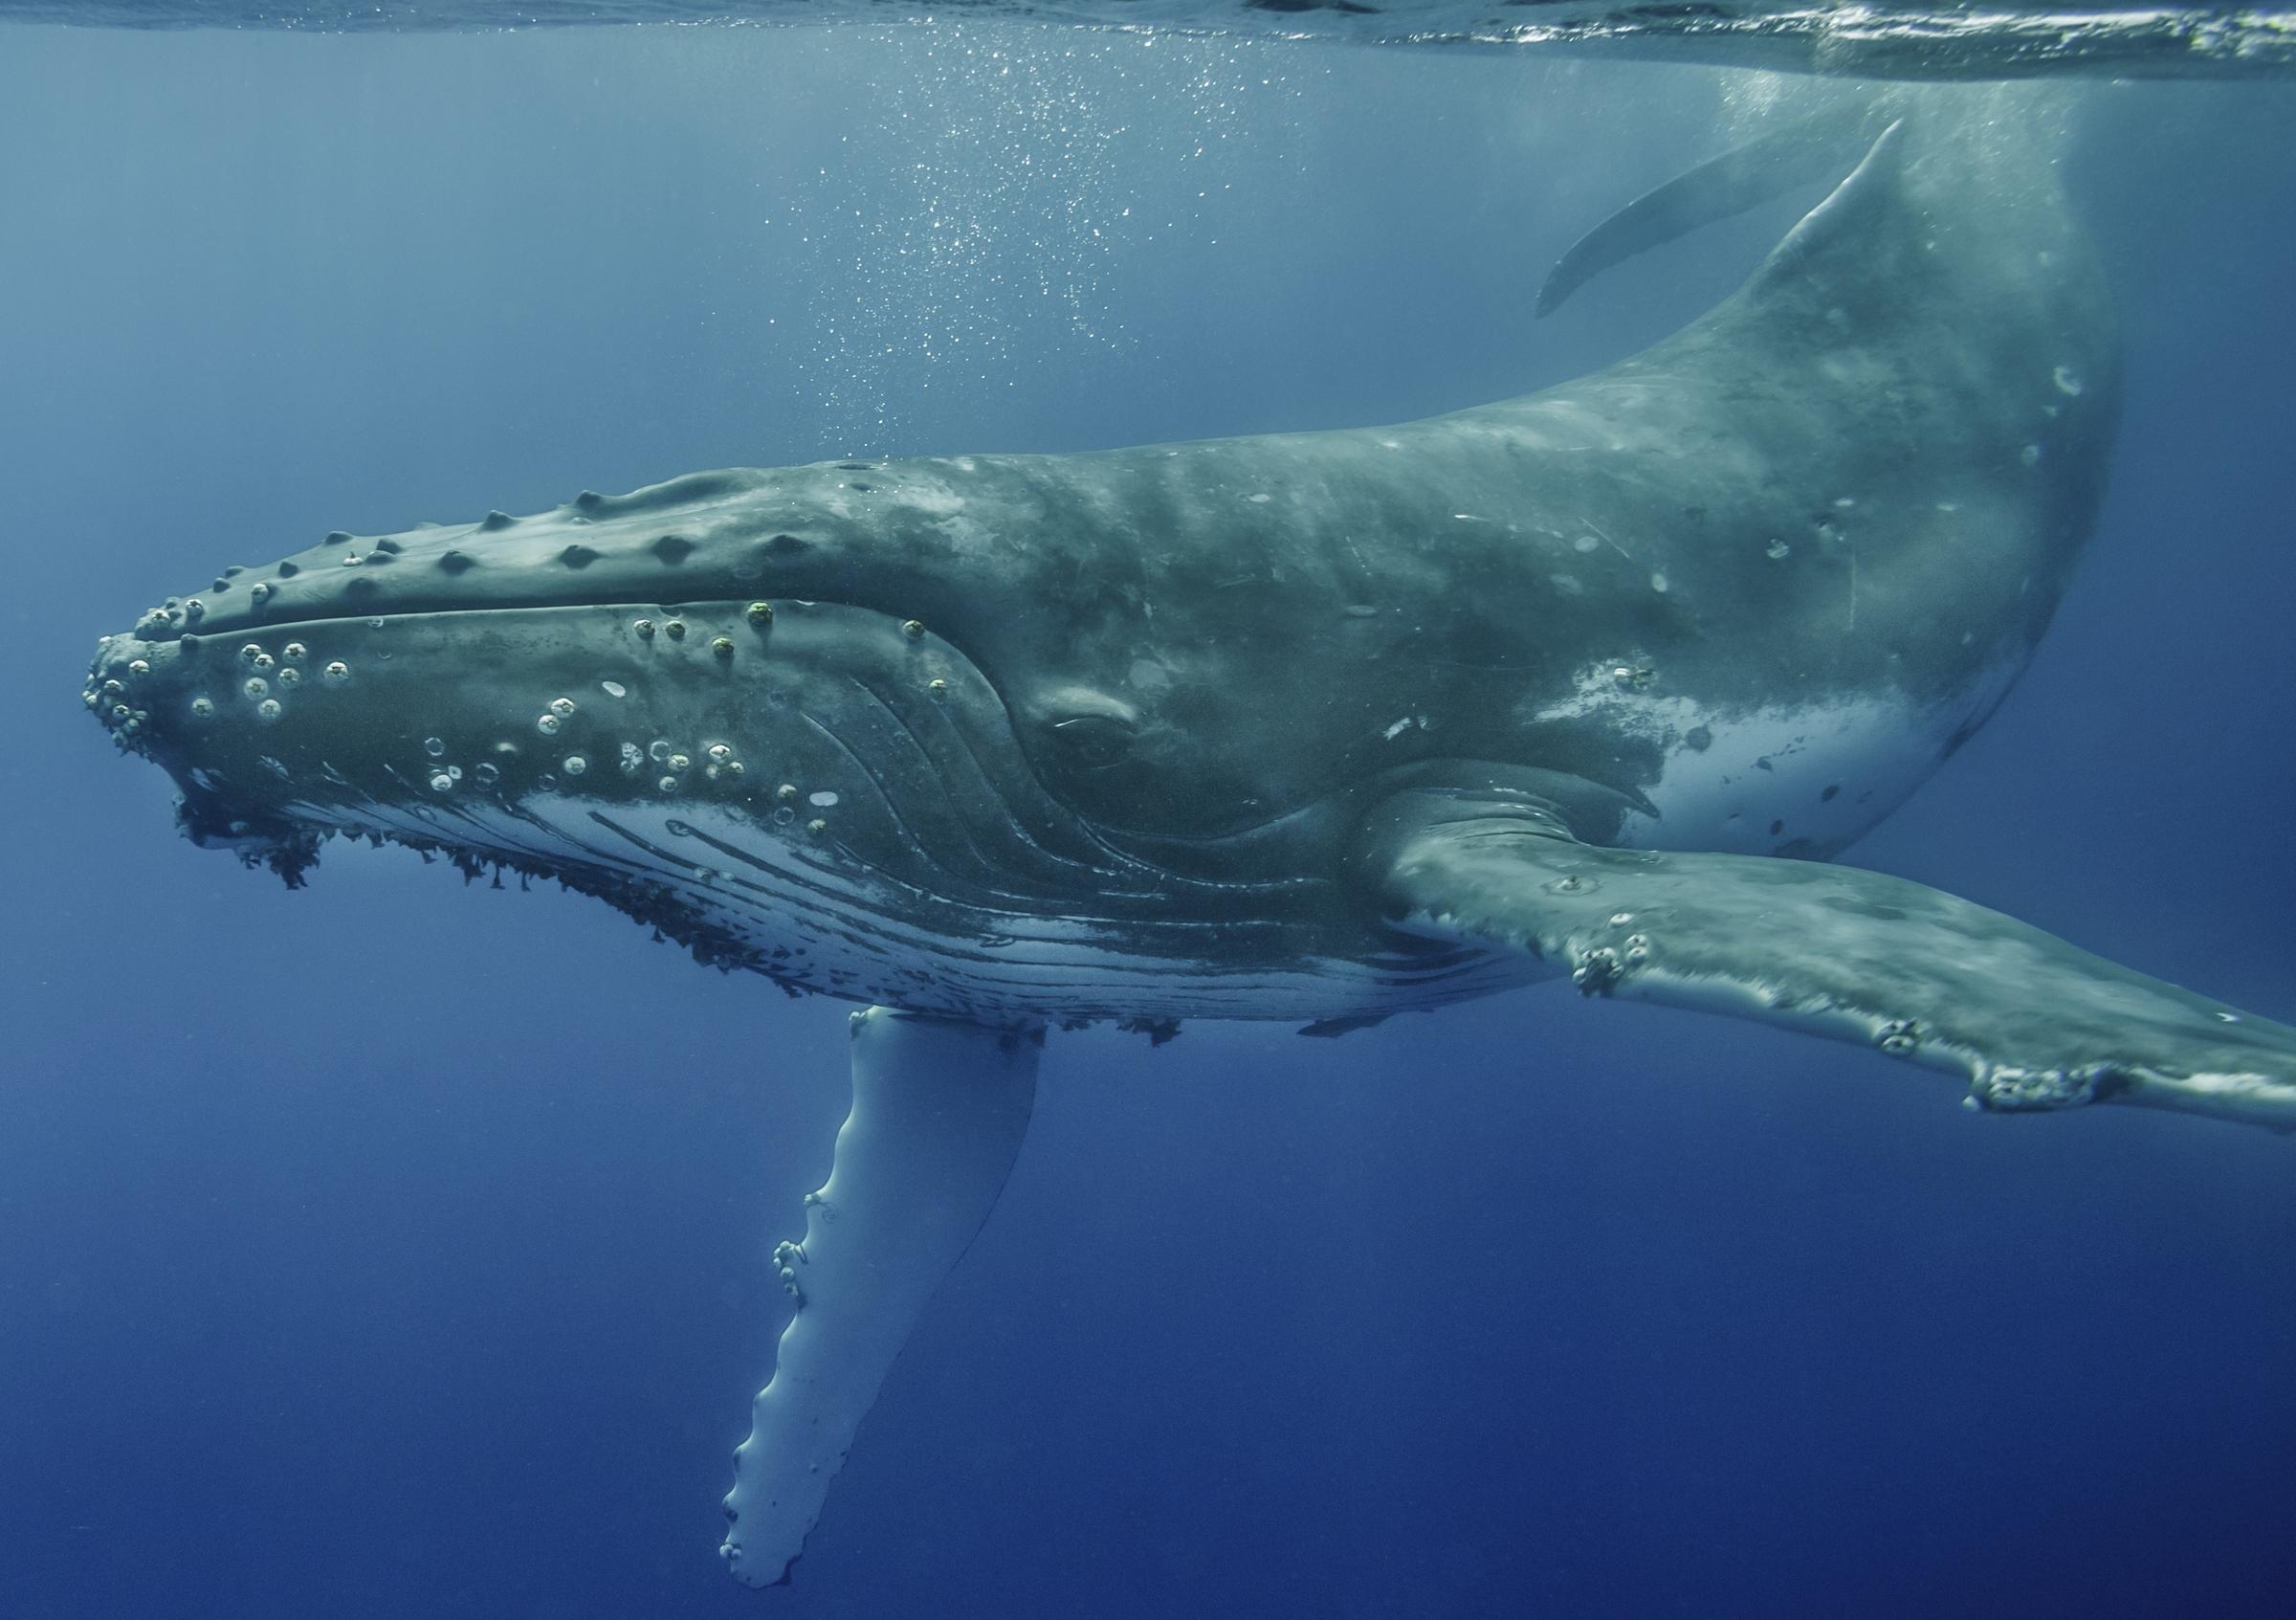 3d Dice Desktop Wallpaper Humpback Whale Vava U Tonga Art Wolfe